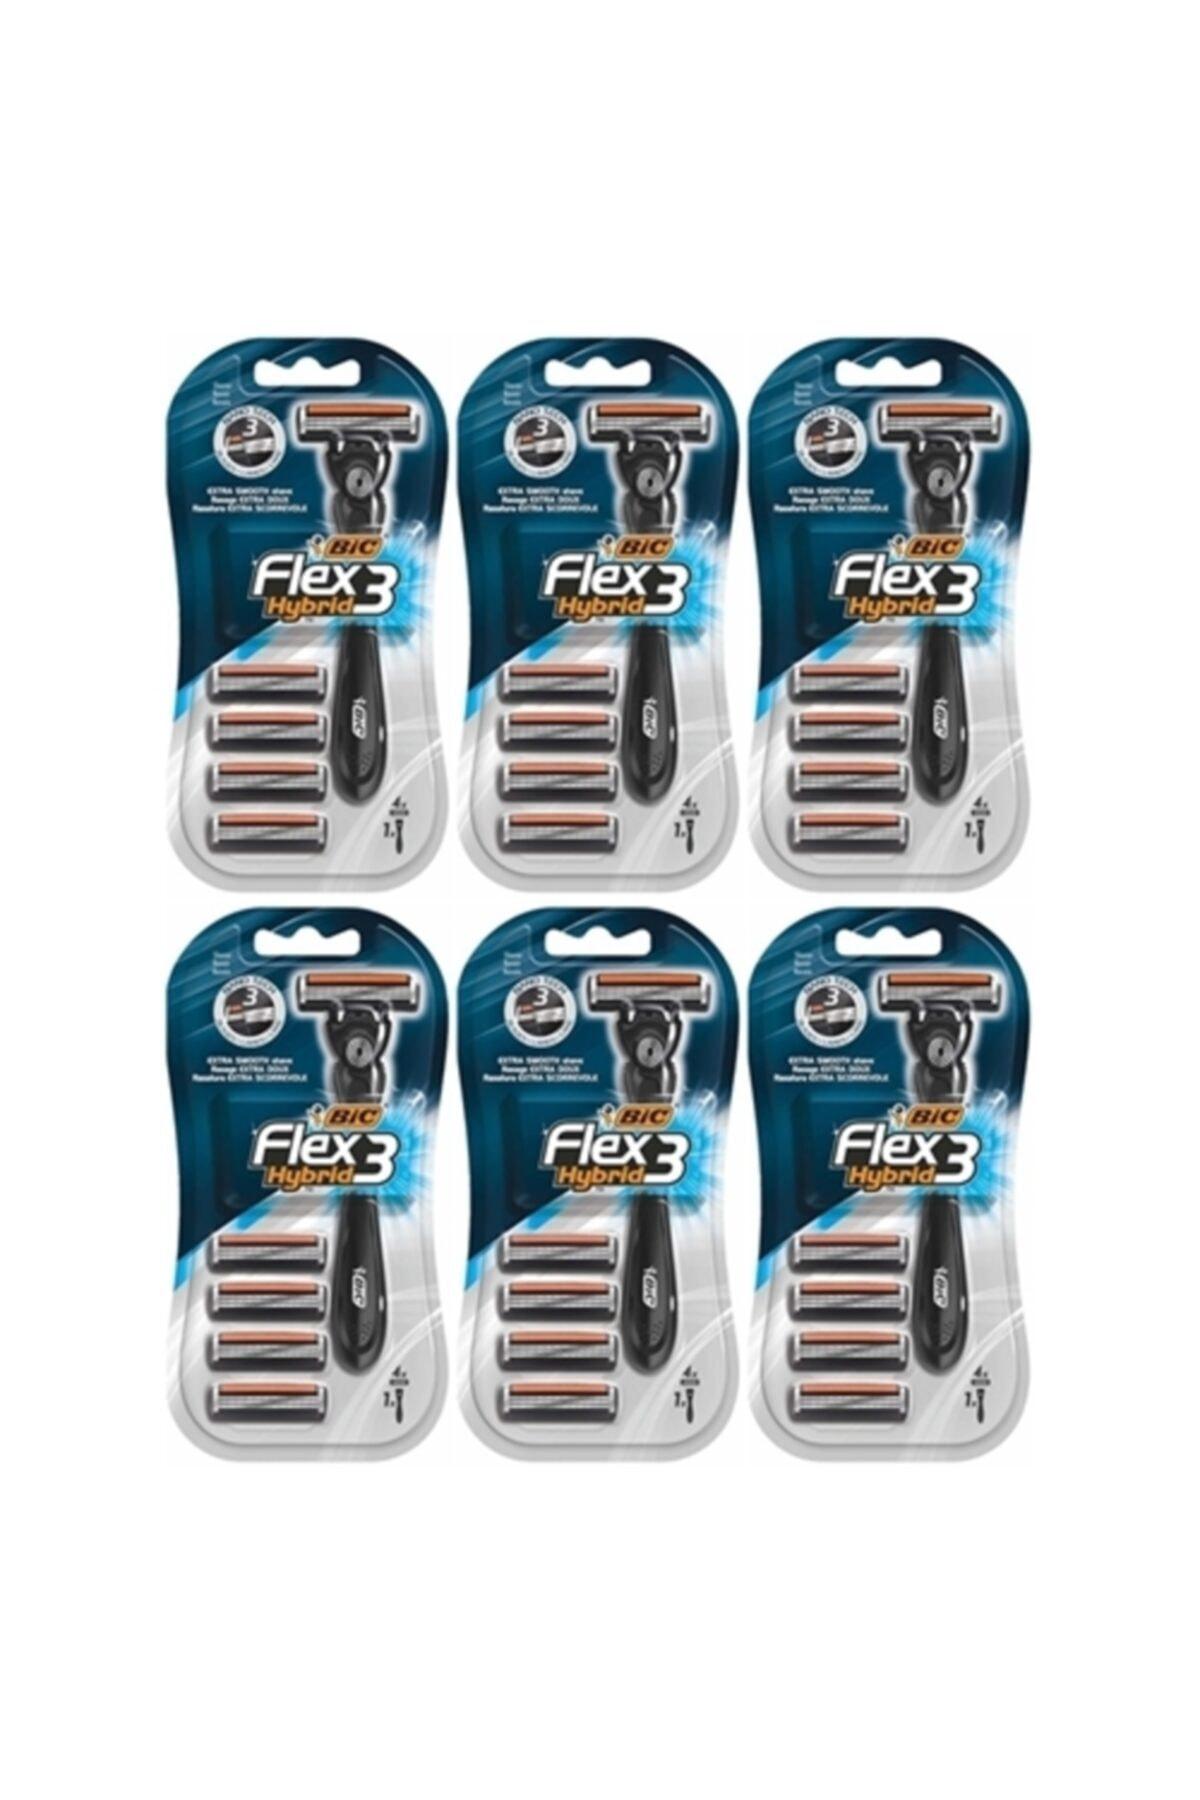 Bic Flex3 Hybrid Tıraş Bıçağı 4 Yedek 1 Sap X 6 Adet 2